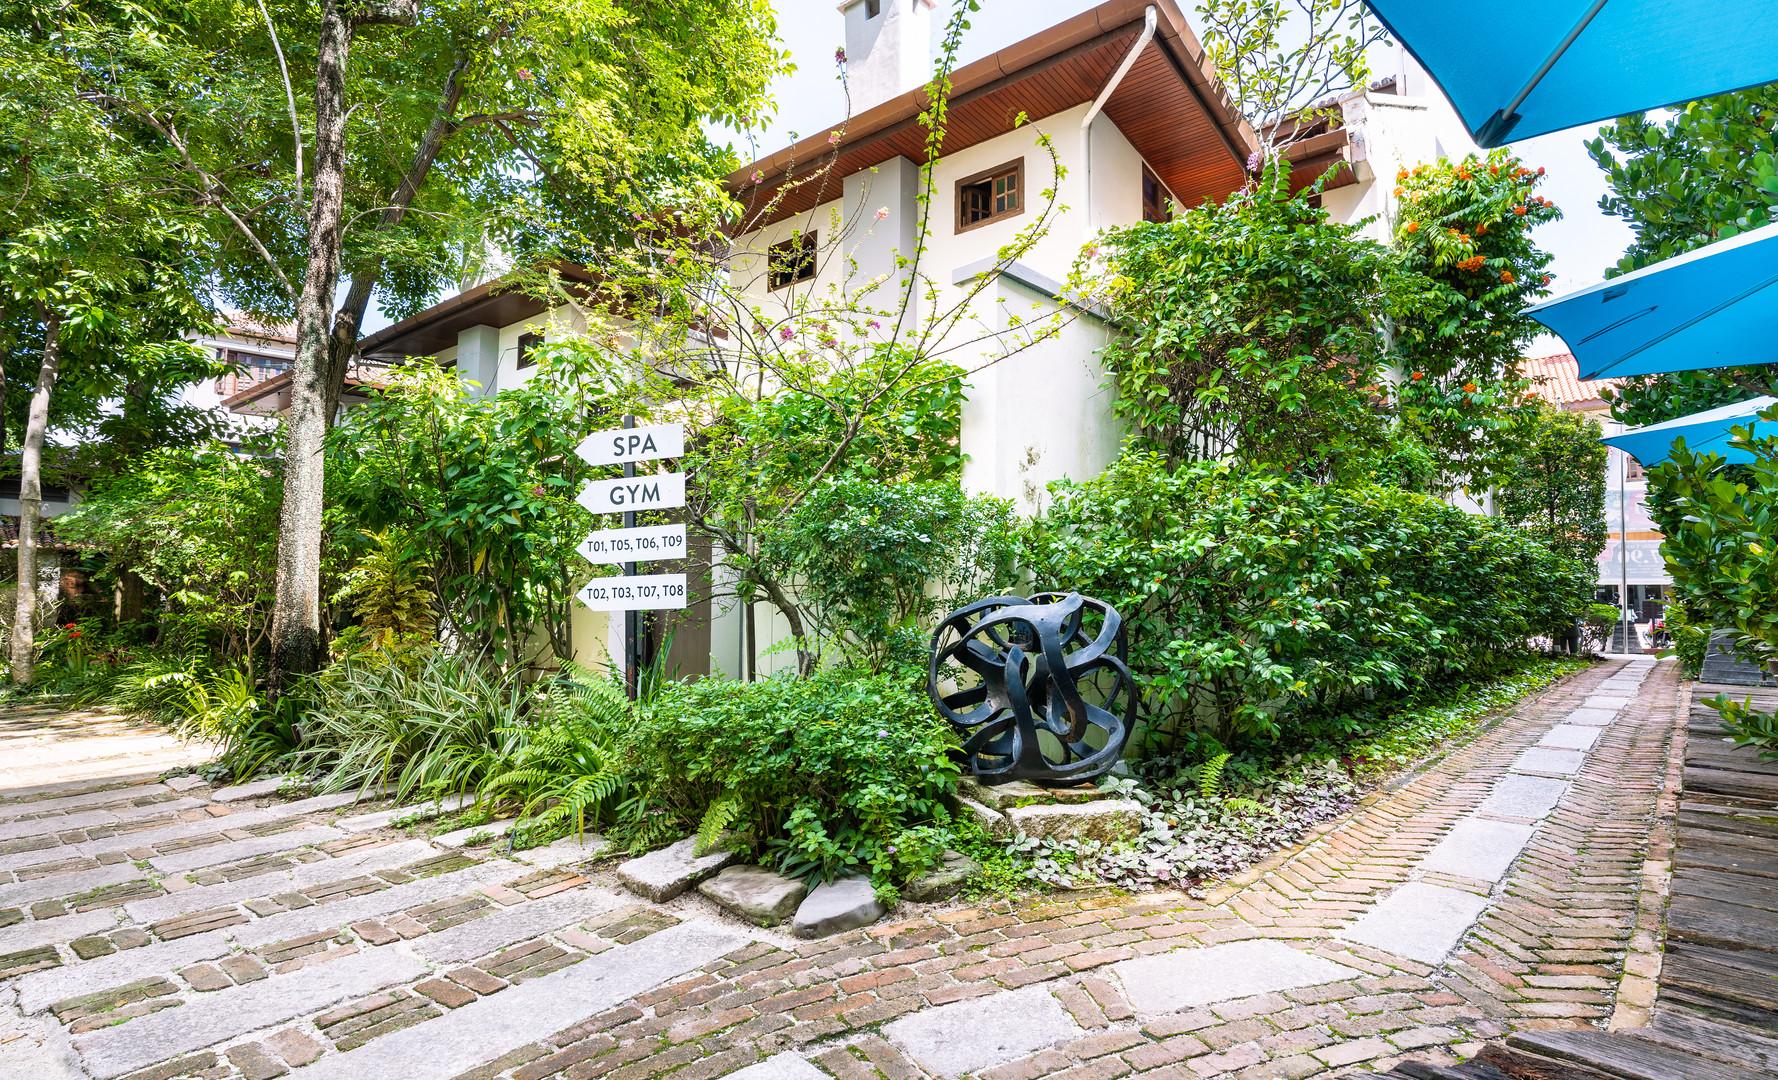 Hotel Penaga - Garden Area (2)